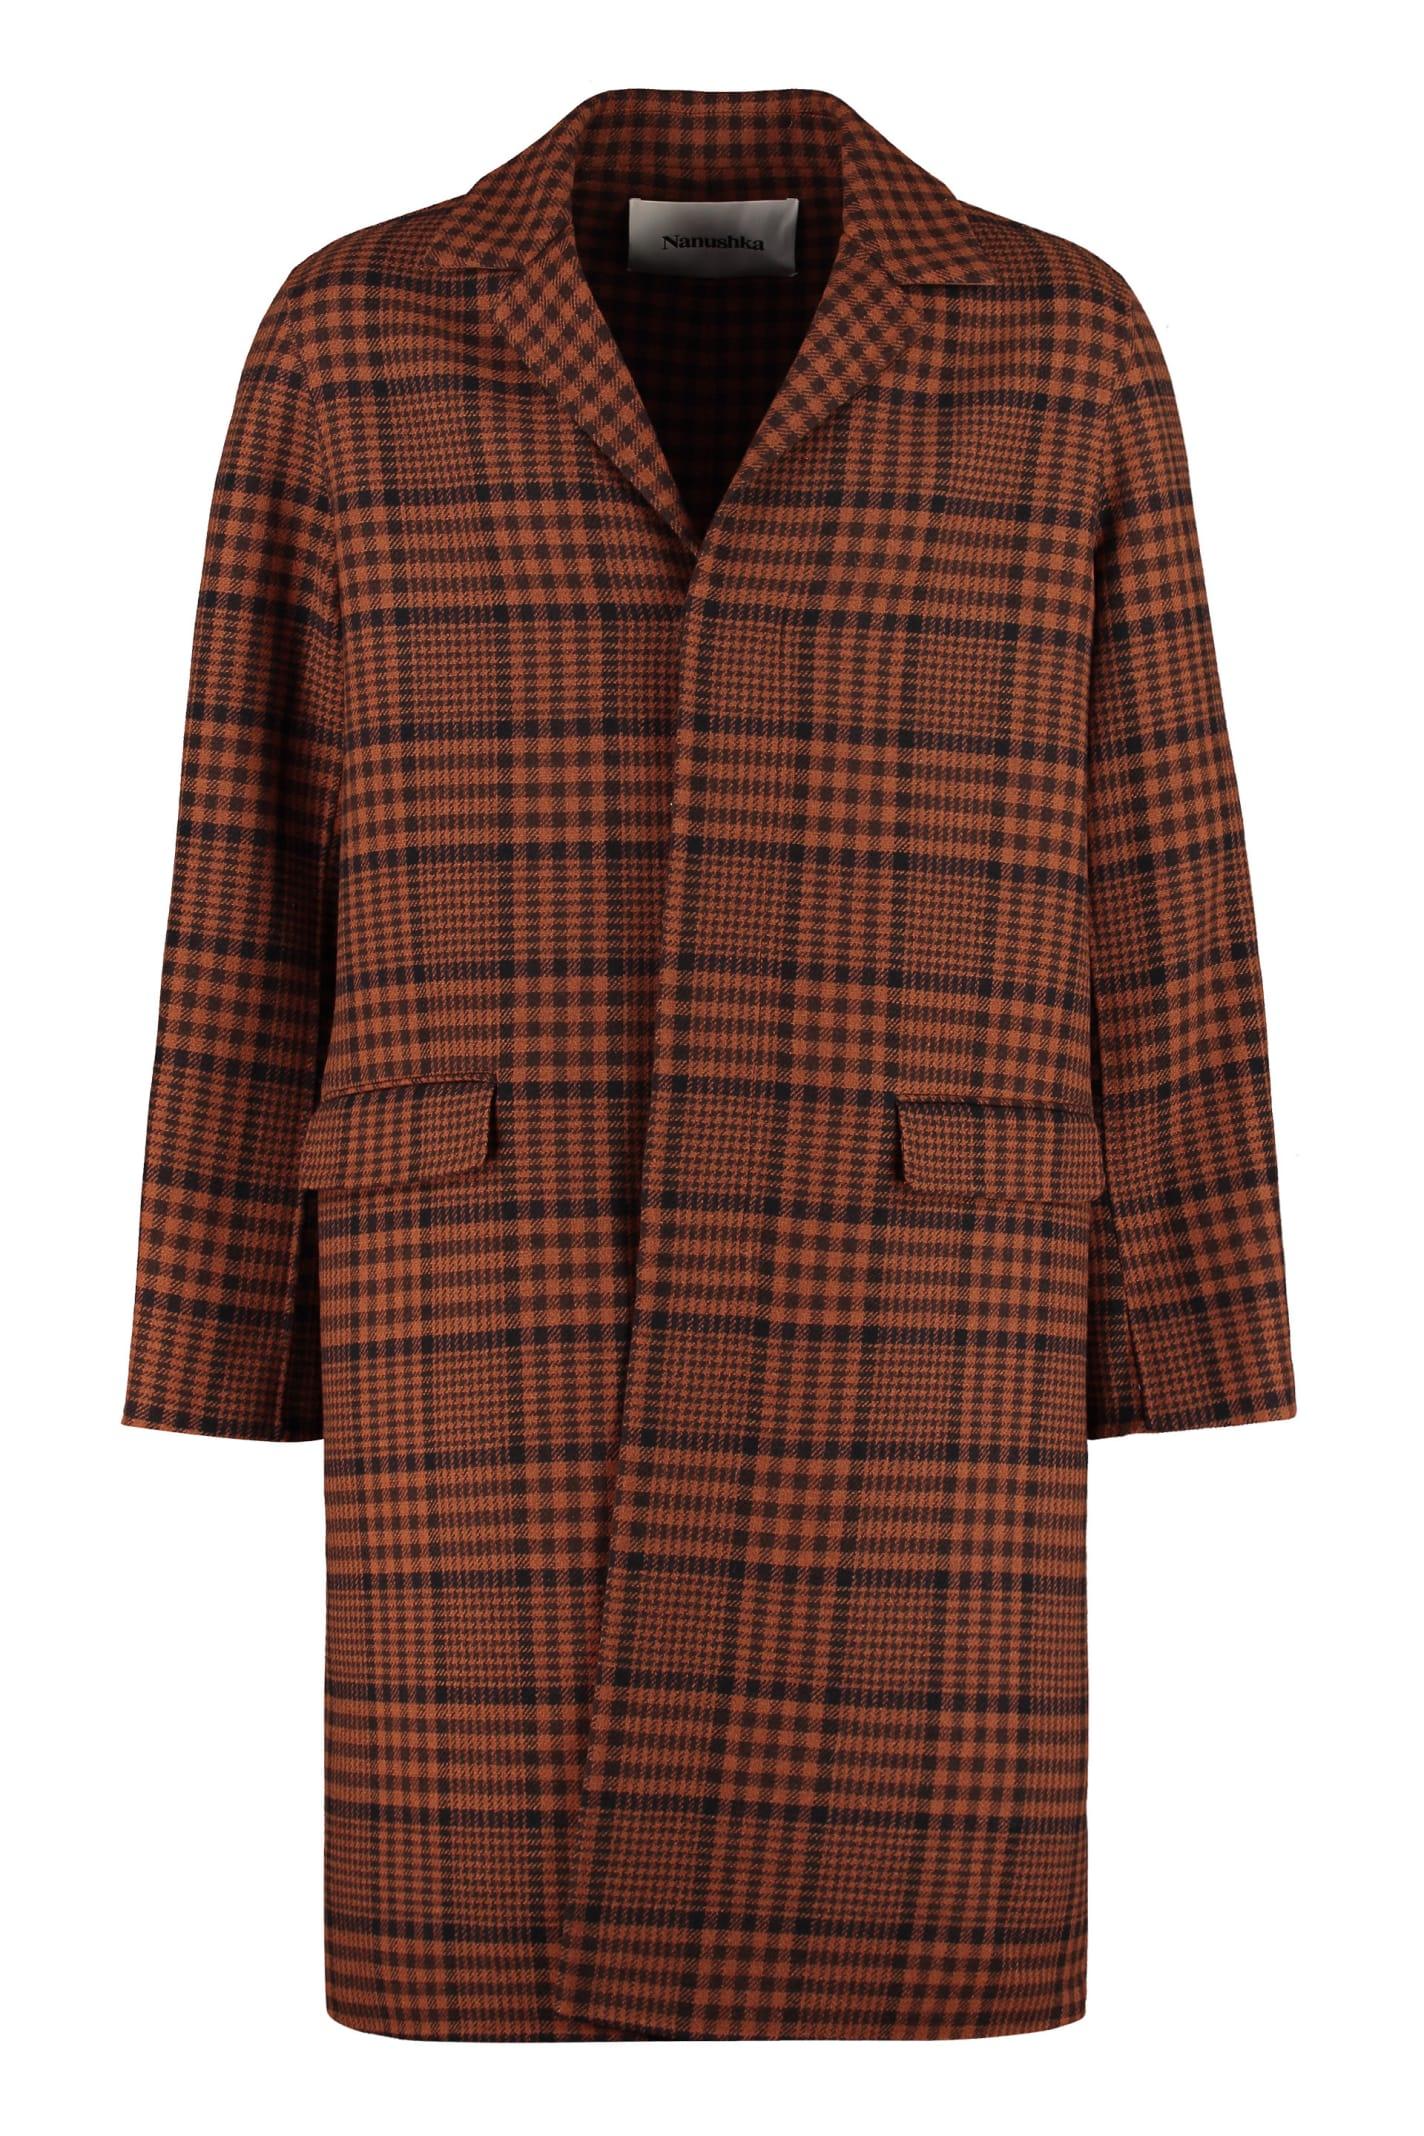 Nanushka Malick Wool Coat In Brown